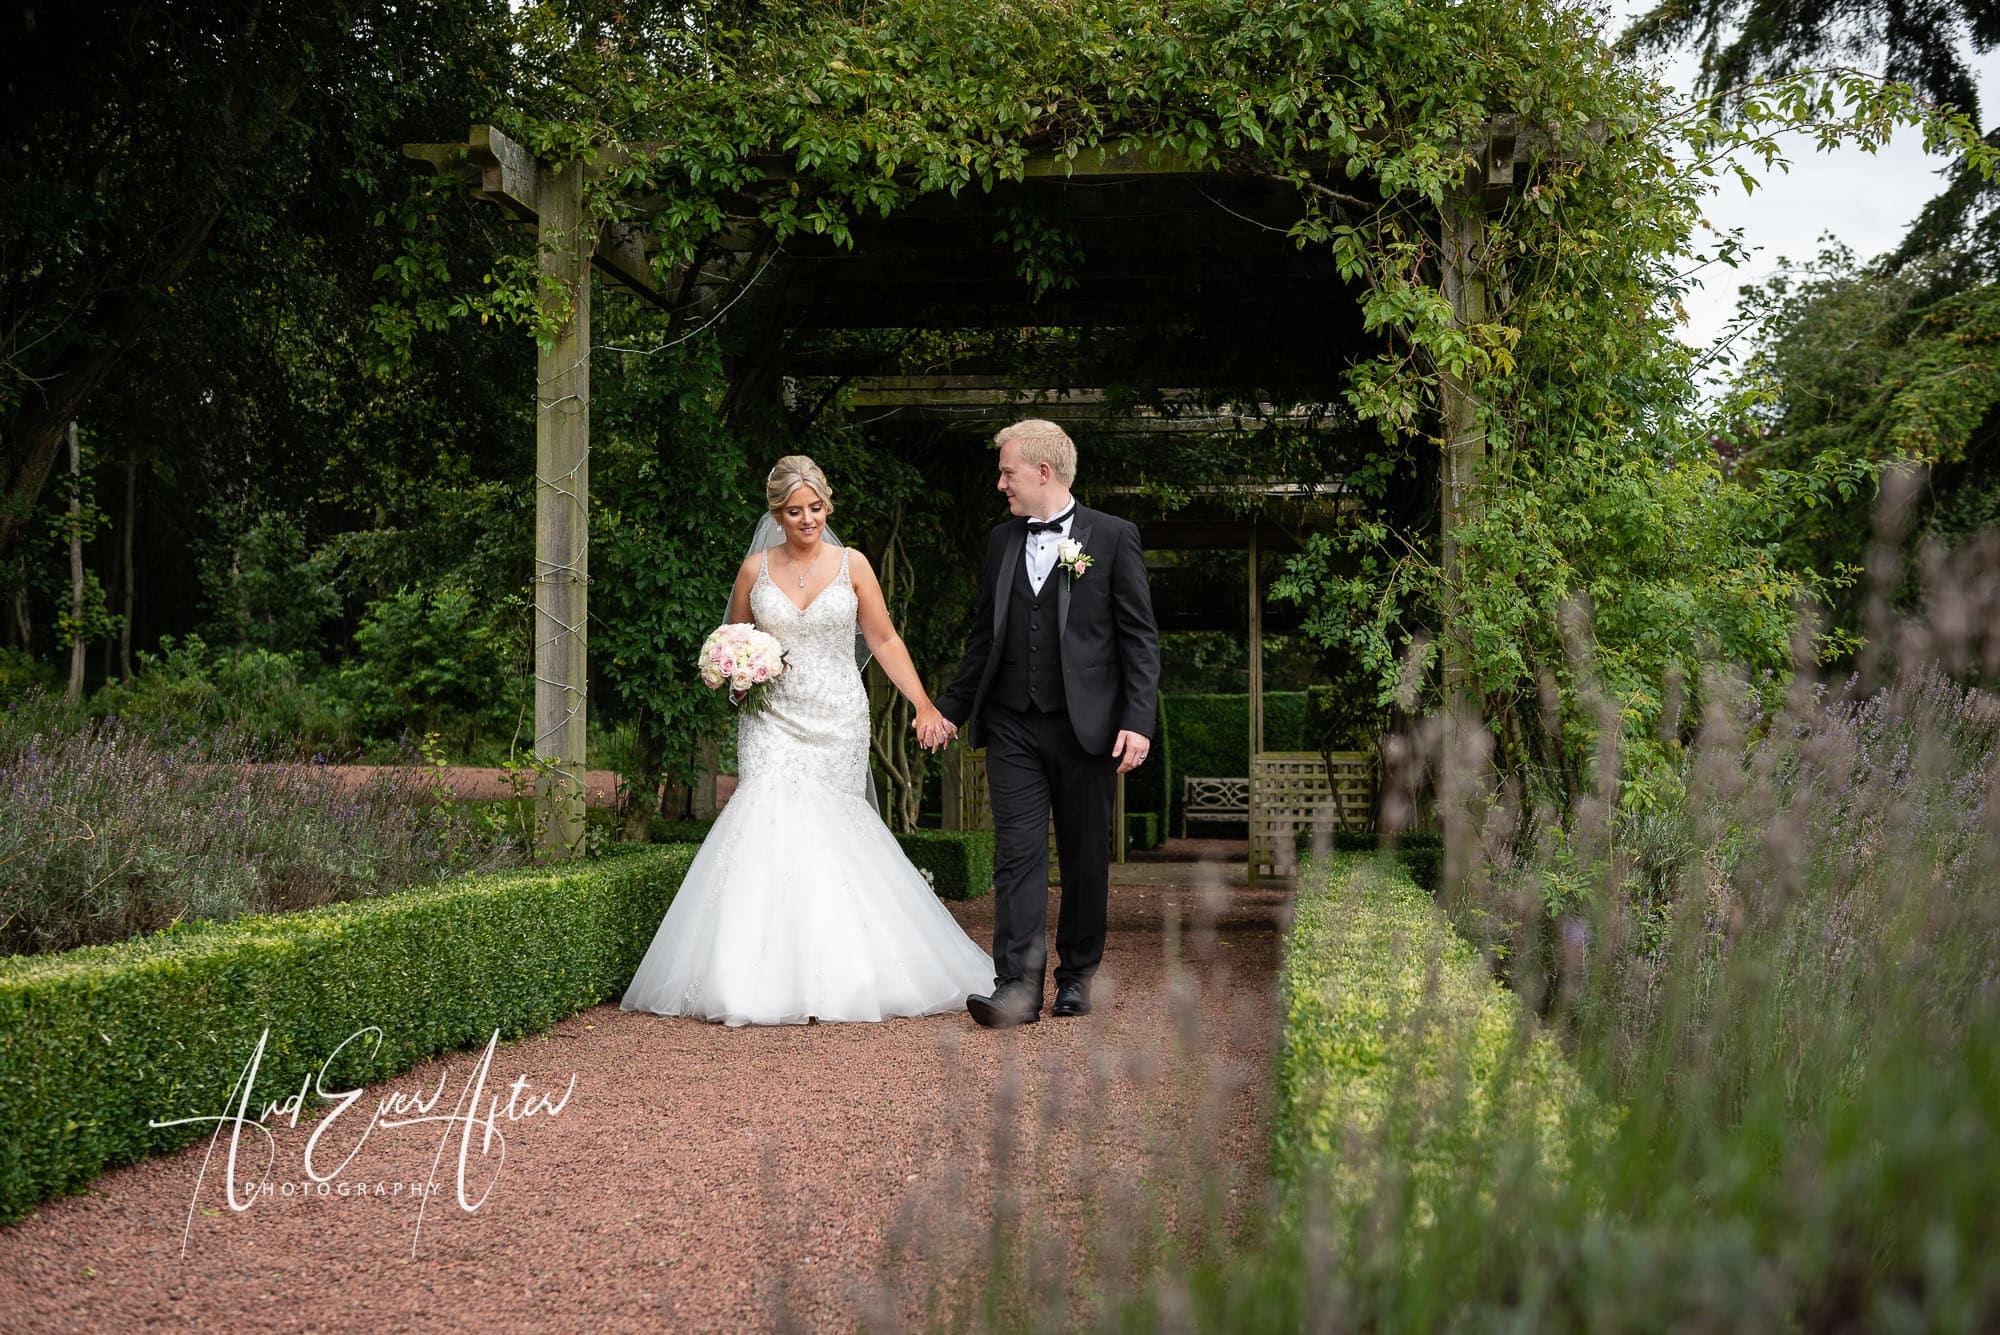 Matfen Hall Wedding Photography, bride and groom walking at Matfen